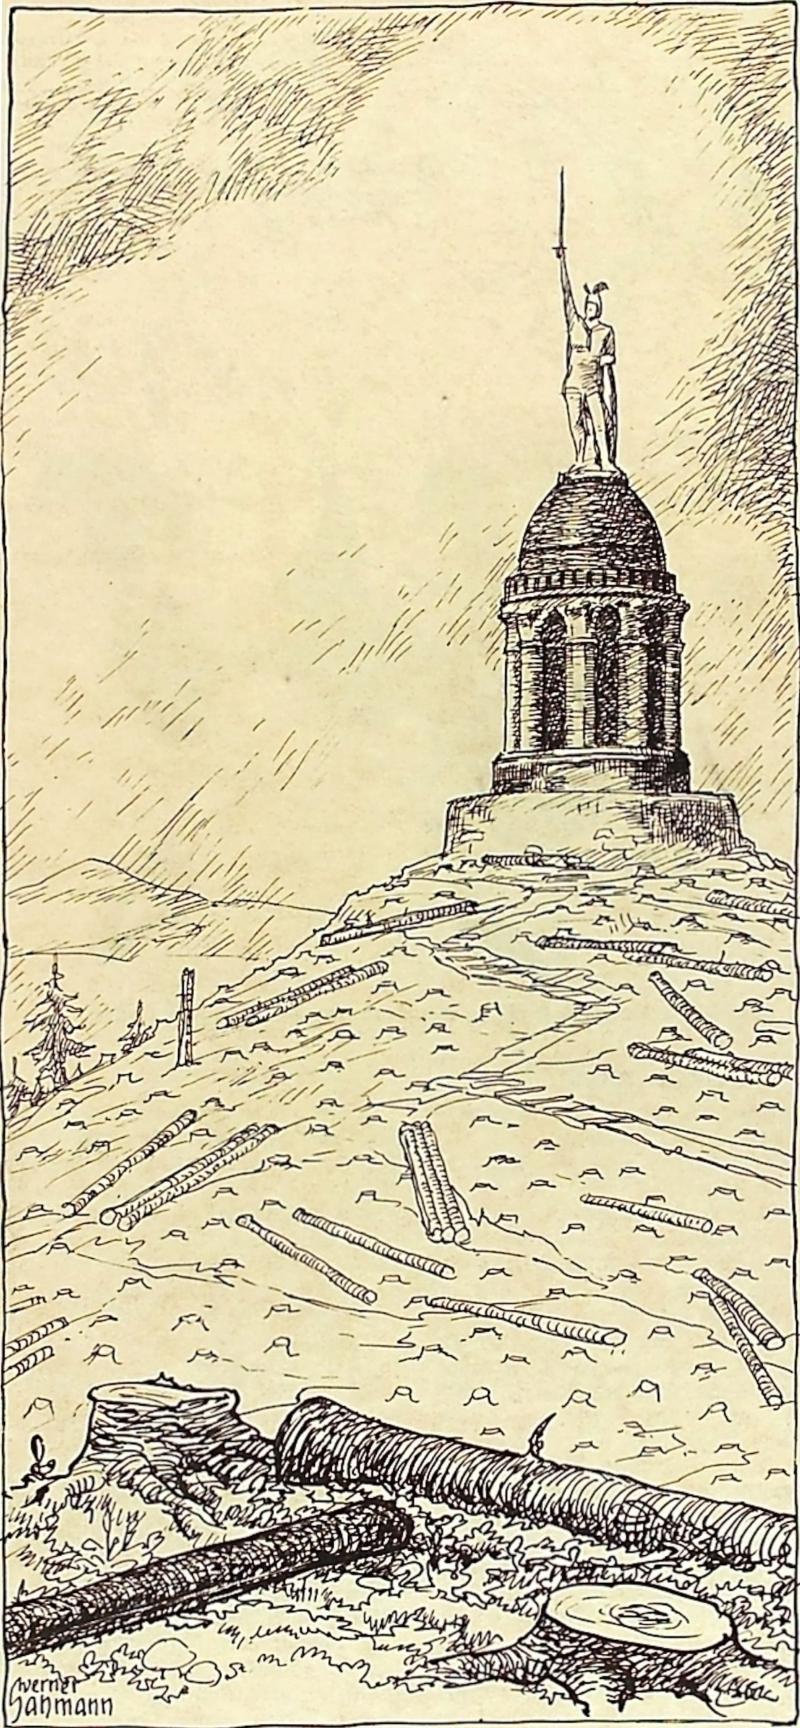 From Kladderadatsch  1922.  07-025